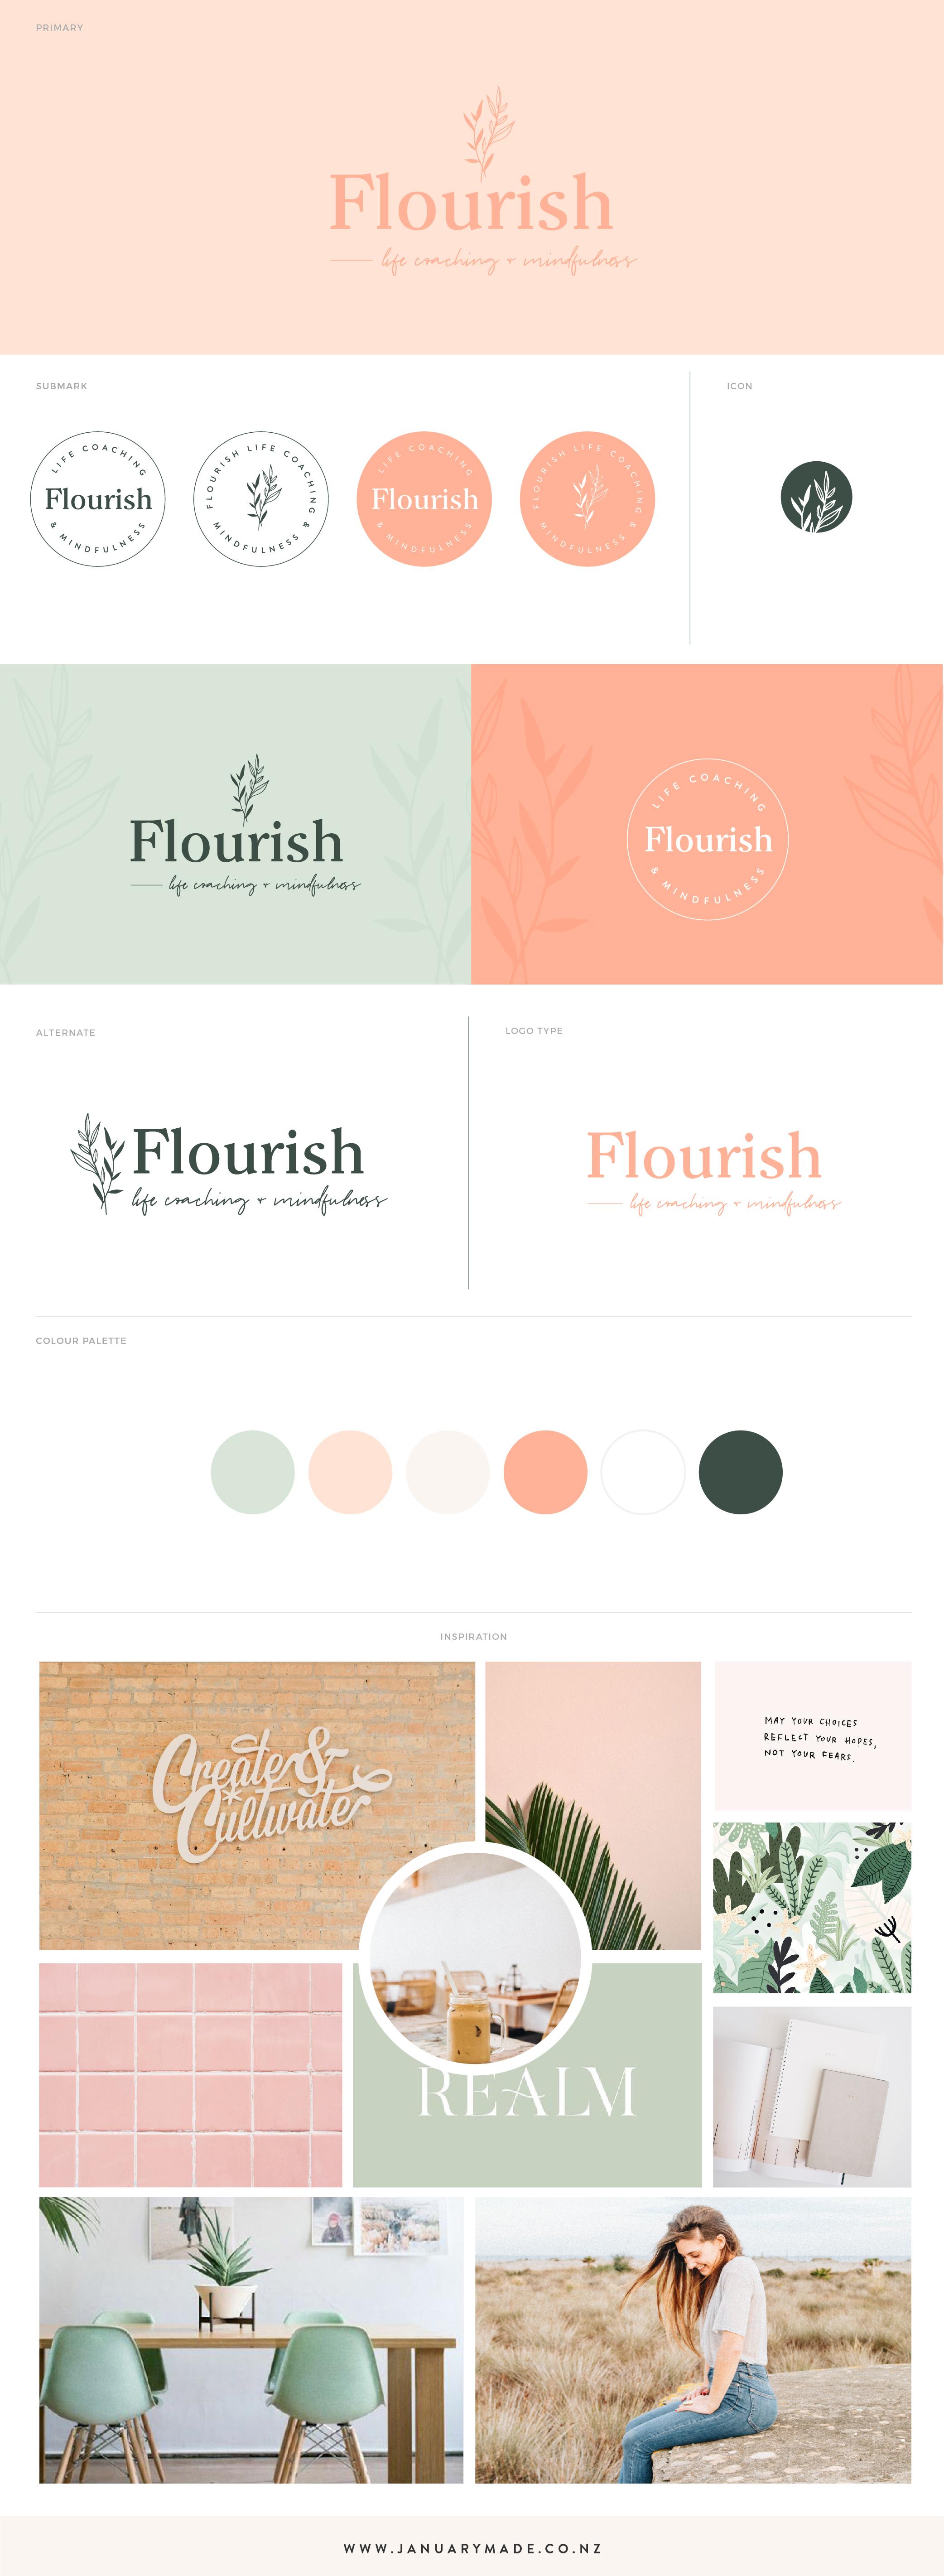 Flourish Life Coaching and Mindfulness - by January Made Design